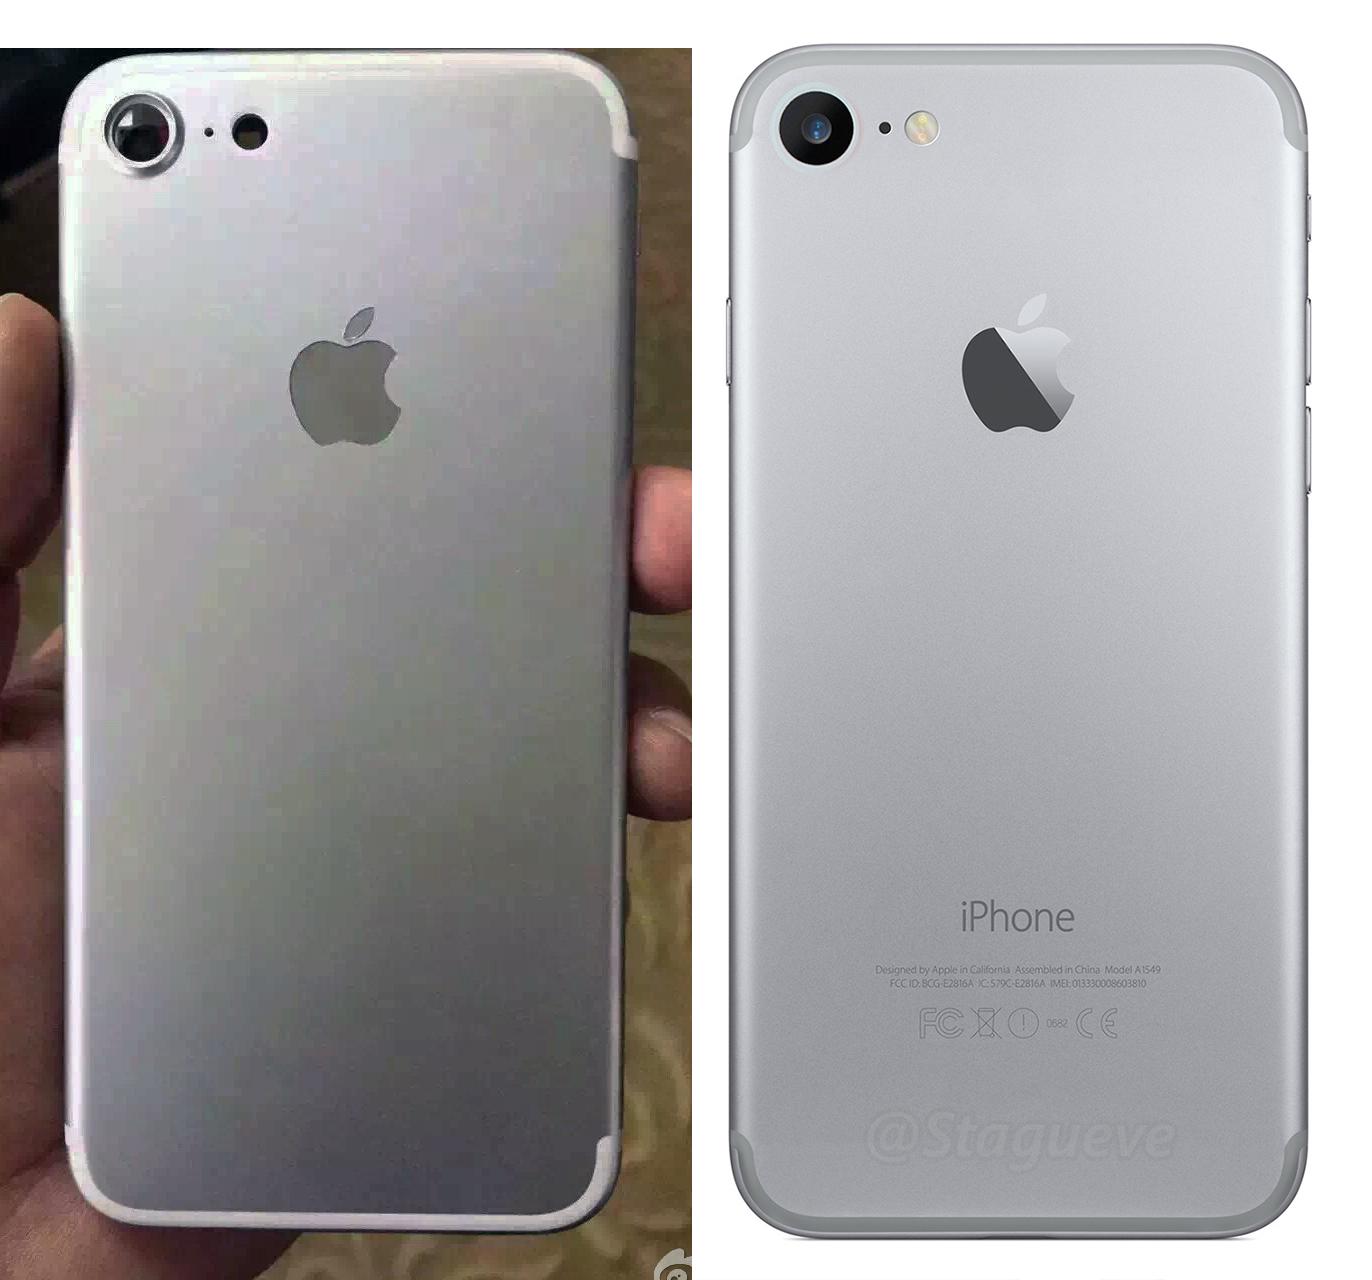 imagine reala iPhone 7